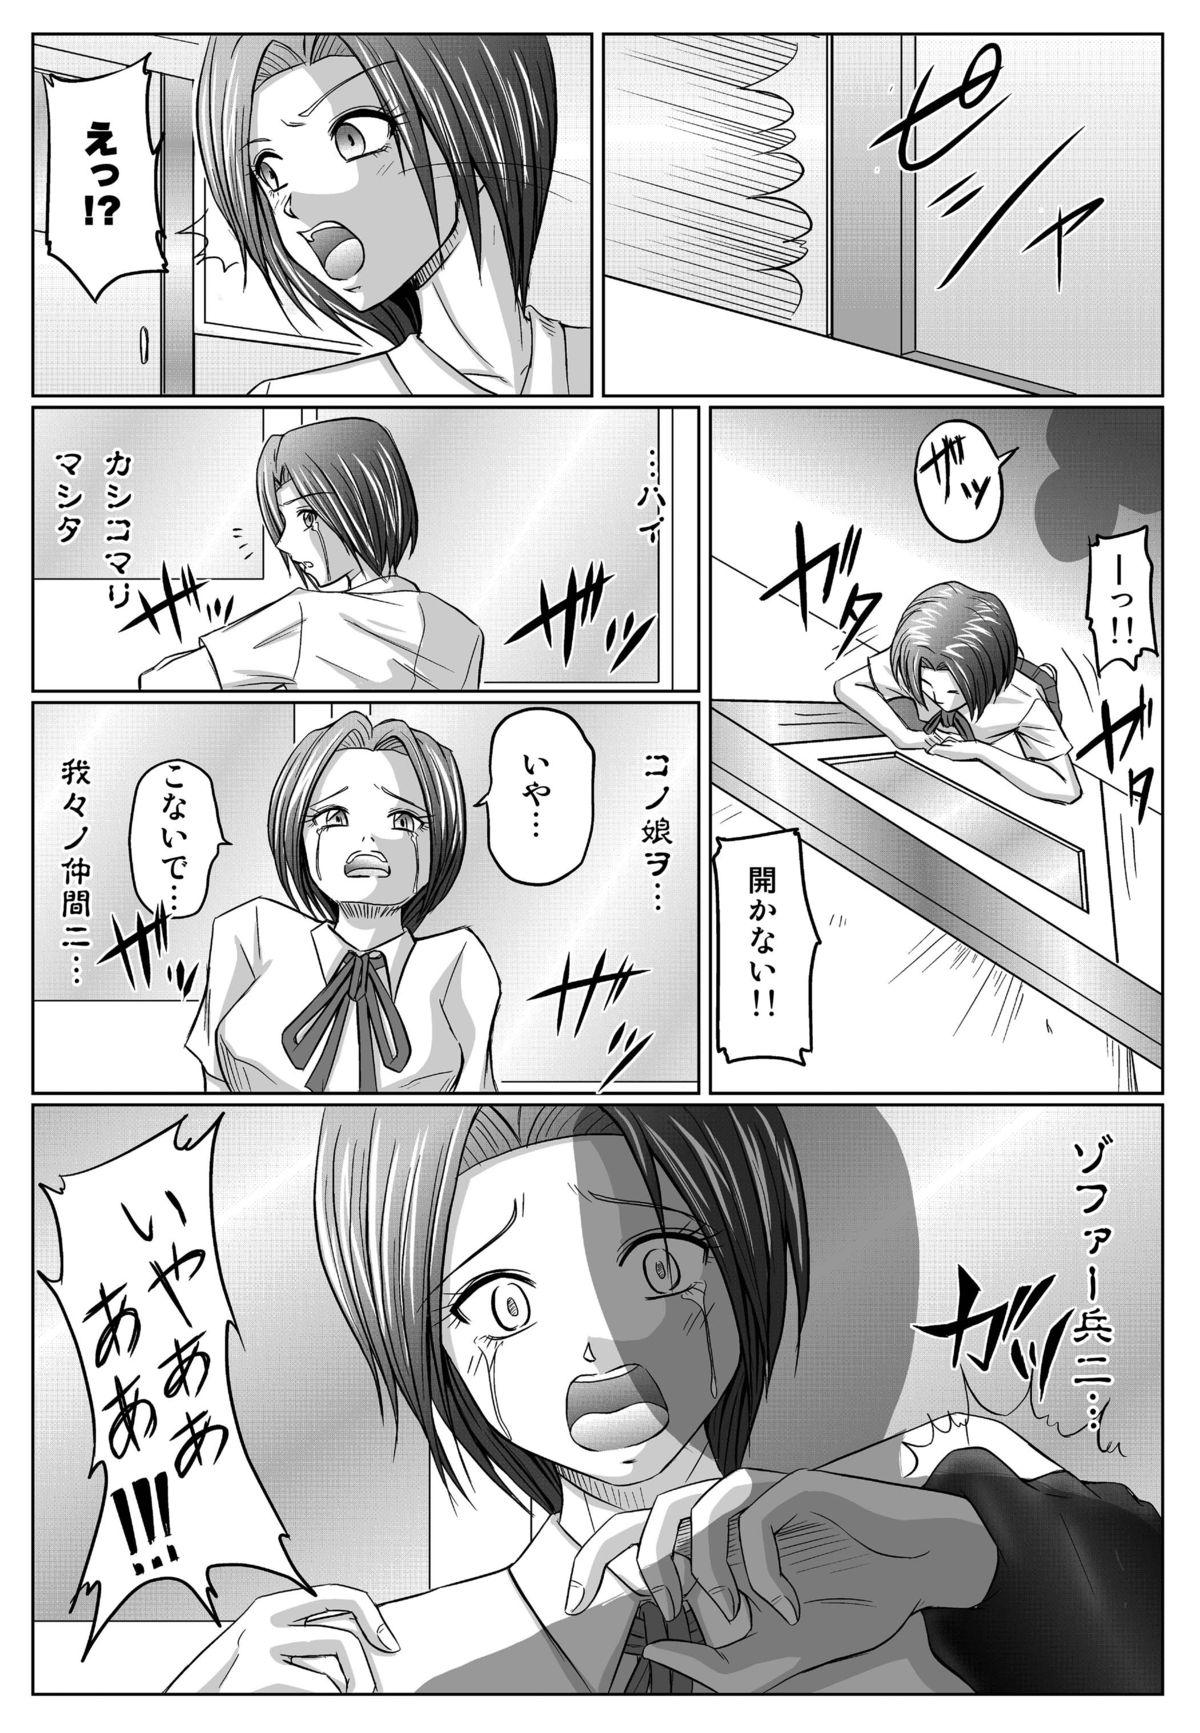 [Macxe's (monmon)] Tokubousentai Dinaranger ~Heroine Kairaku Sennou Keikaku~ Vol.01/02/03 (Renkaban) [Digital] 112